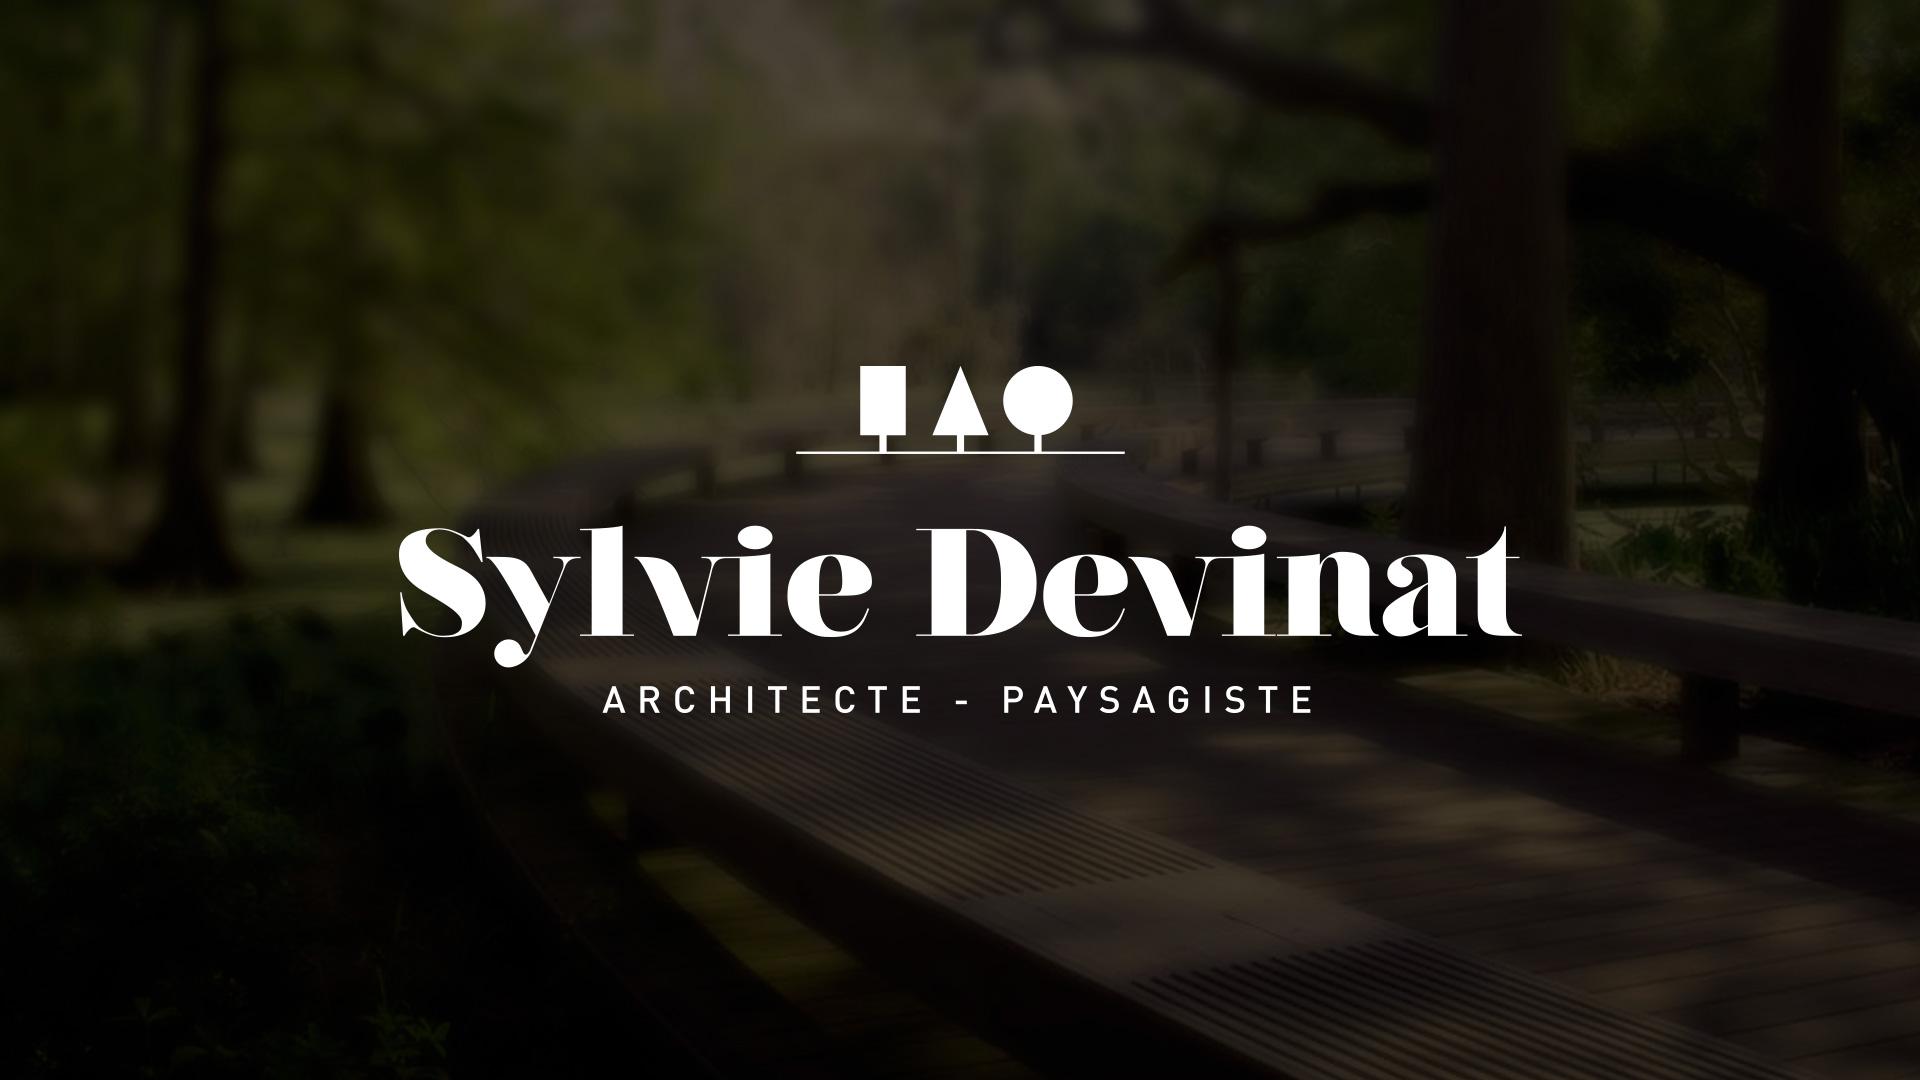 05_florian_branchet_designer_graphique_logo_devinat